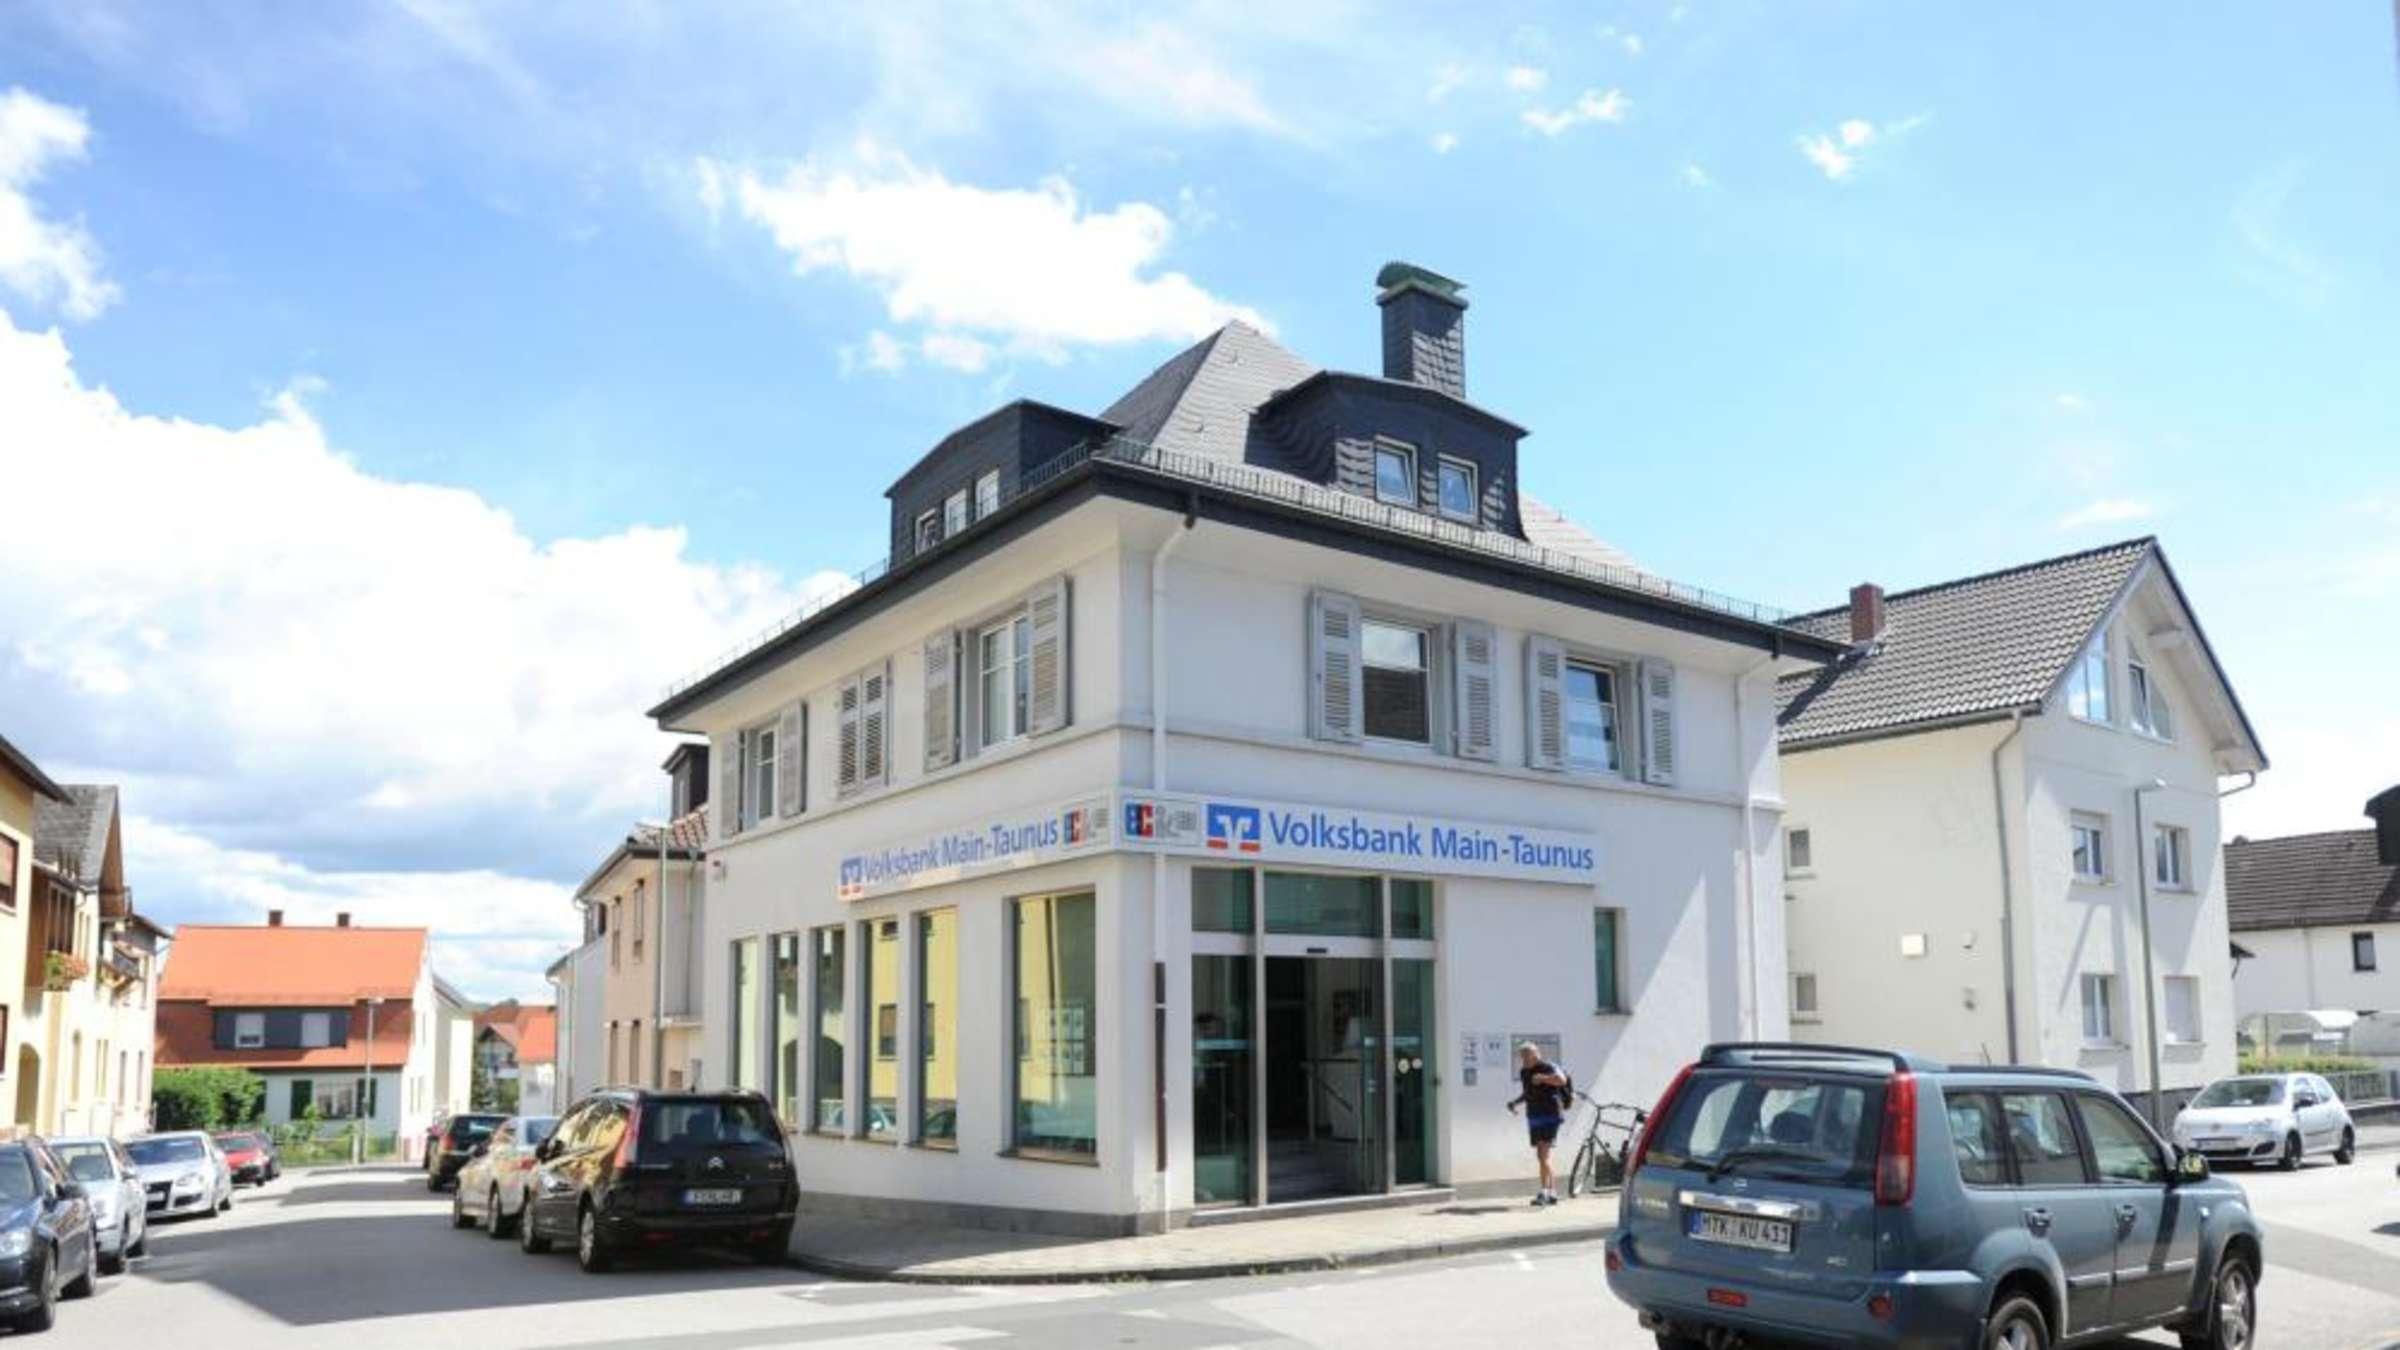 Frankfurter volksbank kelkheim